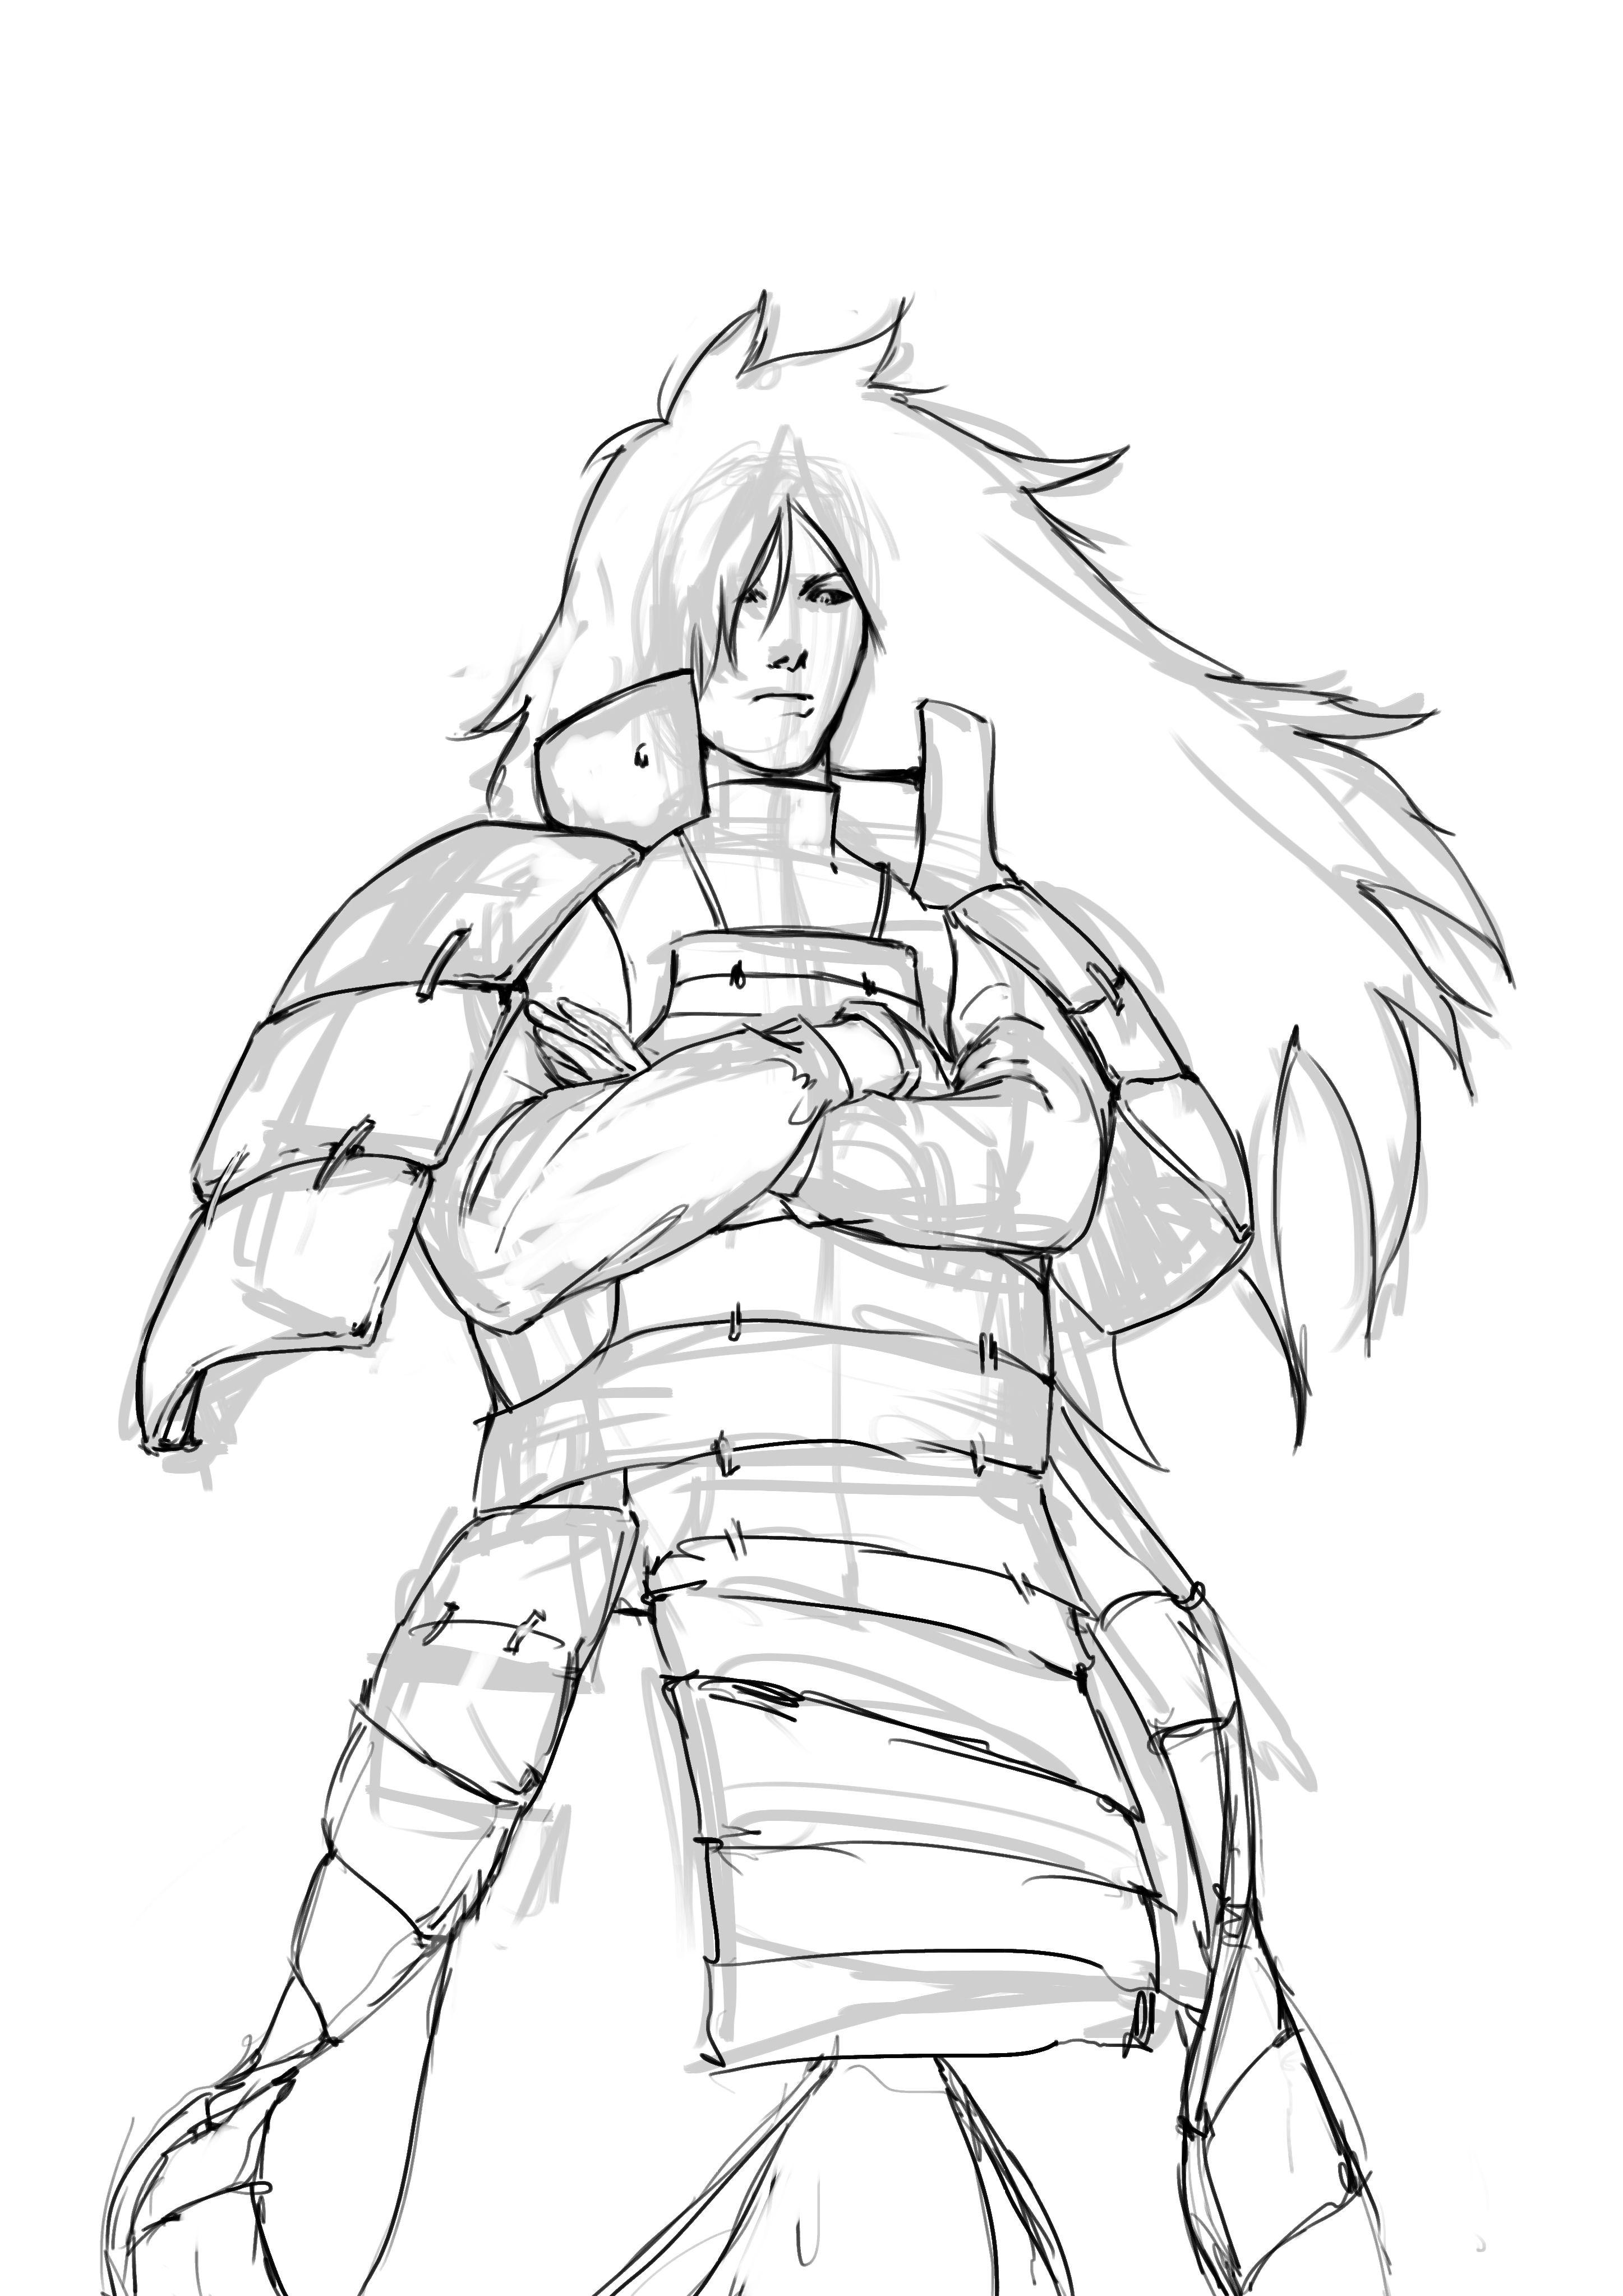 Dibujo Digital Madara Uchija Paso A Paso Arte Y Apuntes Y Monografias Dibujos De Naruto Shippuden Dibujo Digital Itachi Uchiha